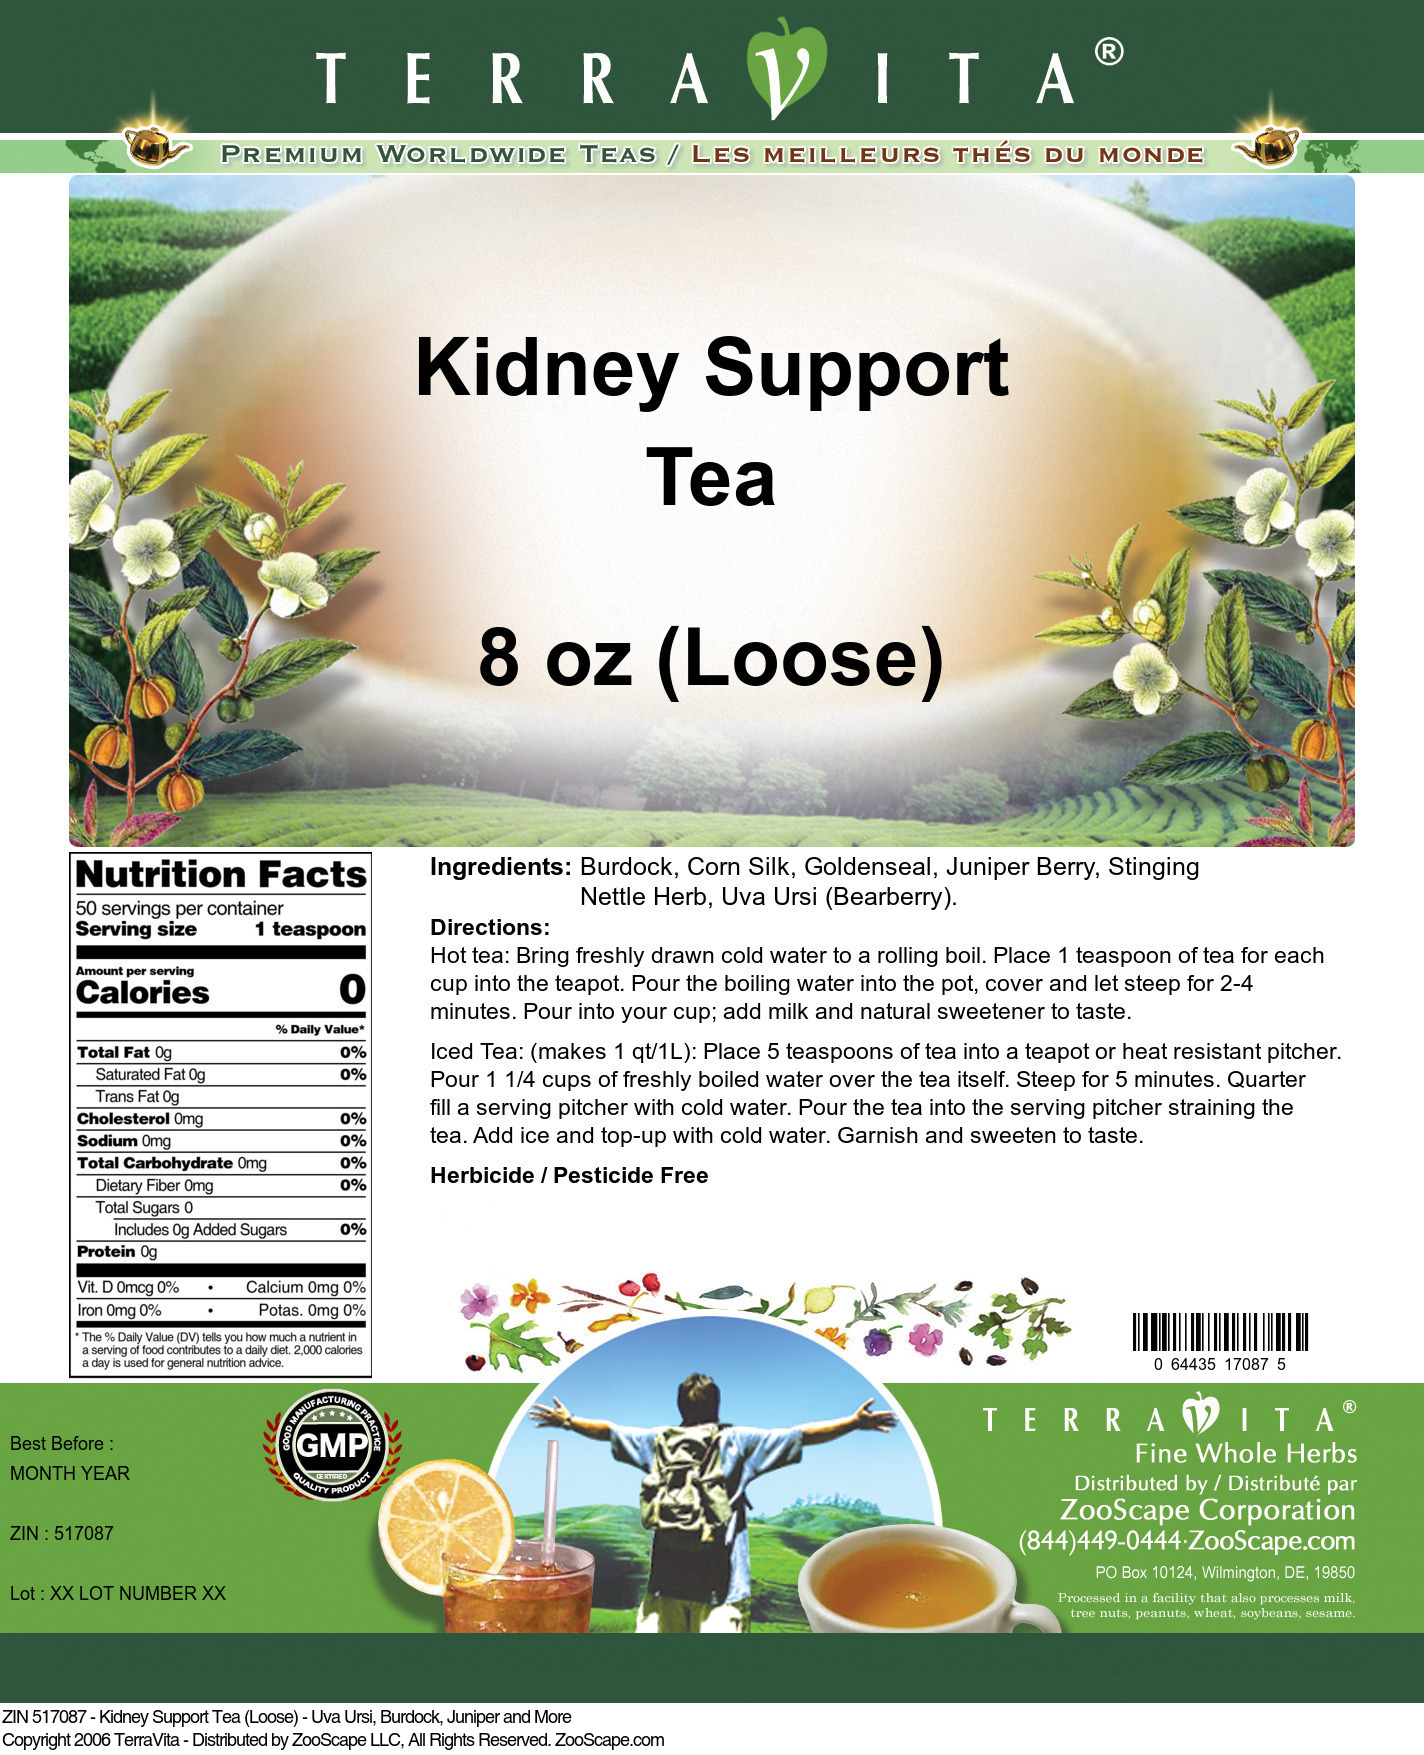 Kidney Support Tea (Loose) - Uva Ursi, Burdock, Juniper and More